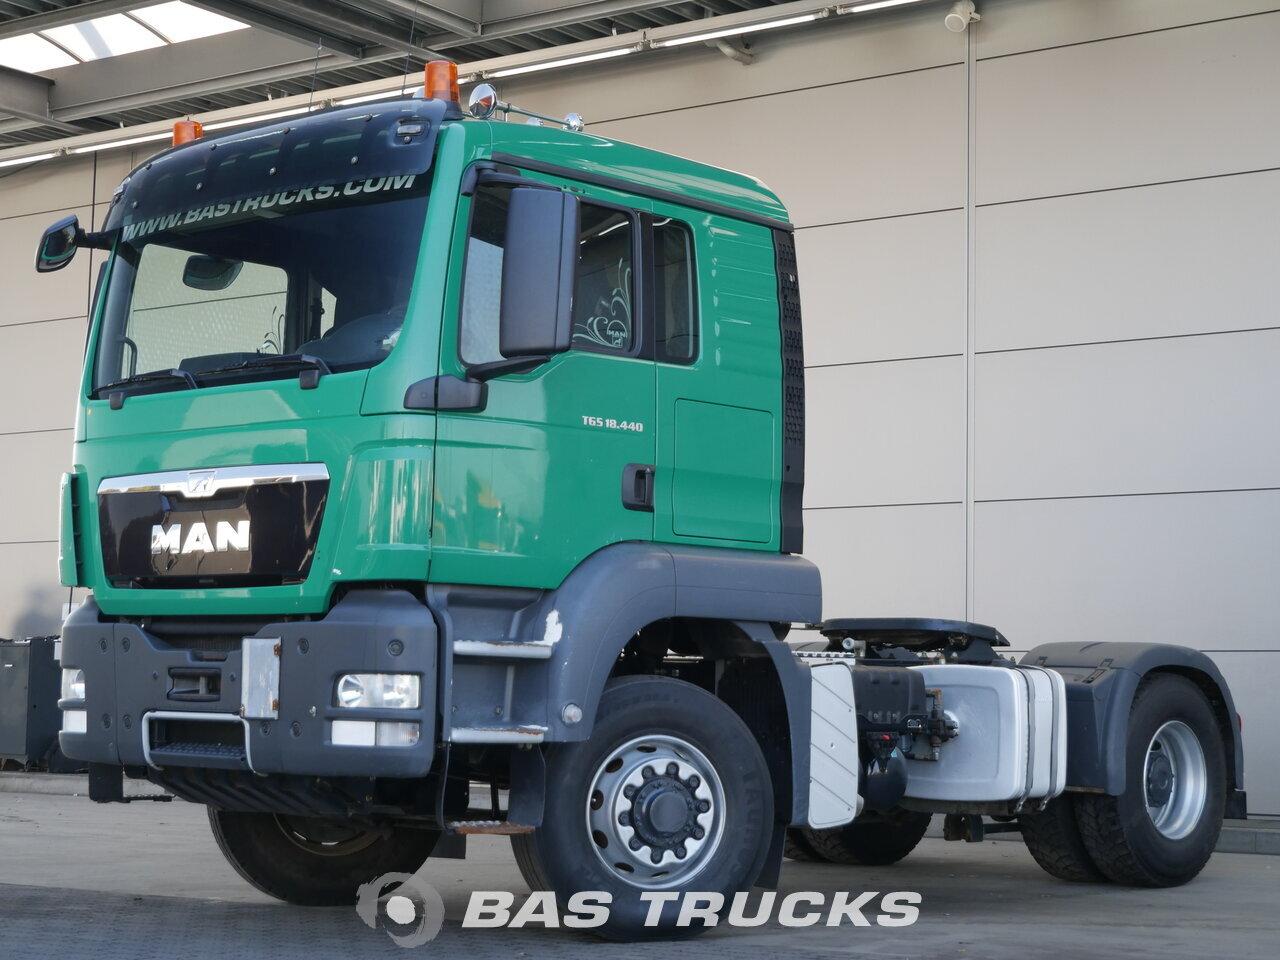 man tgs l szm euro 5 36200 bas trucks. Black Bedroom Furniture Sets. Home Design Ideas